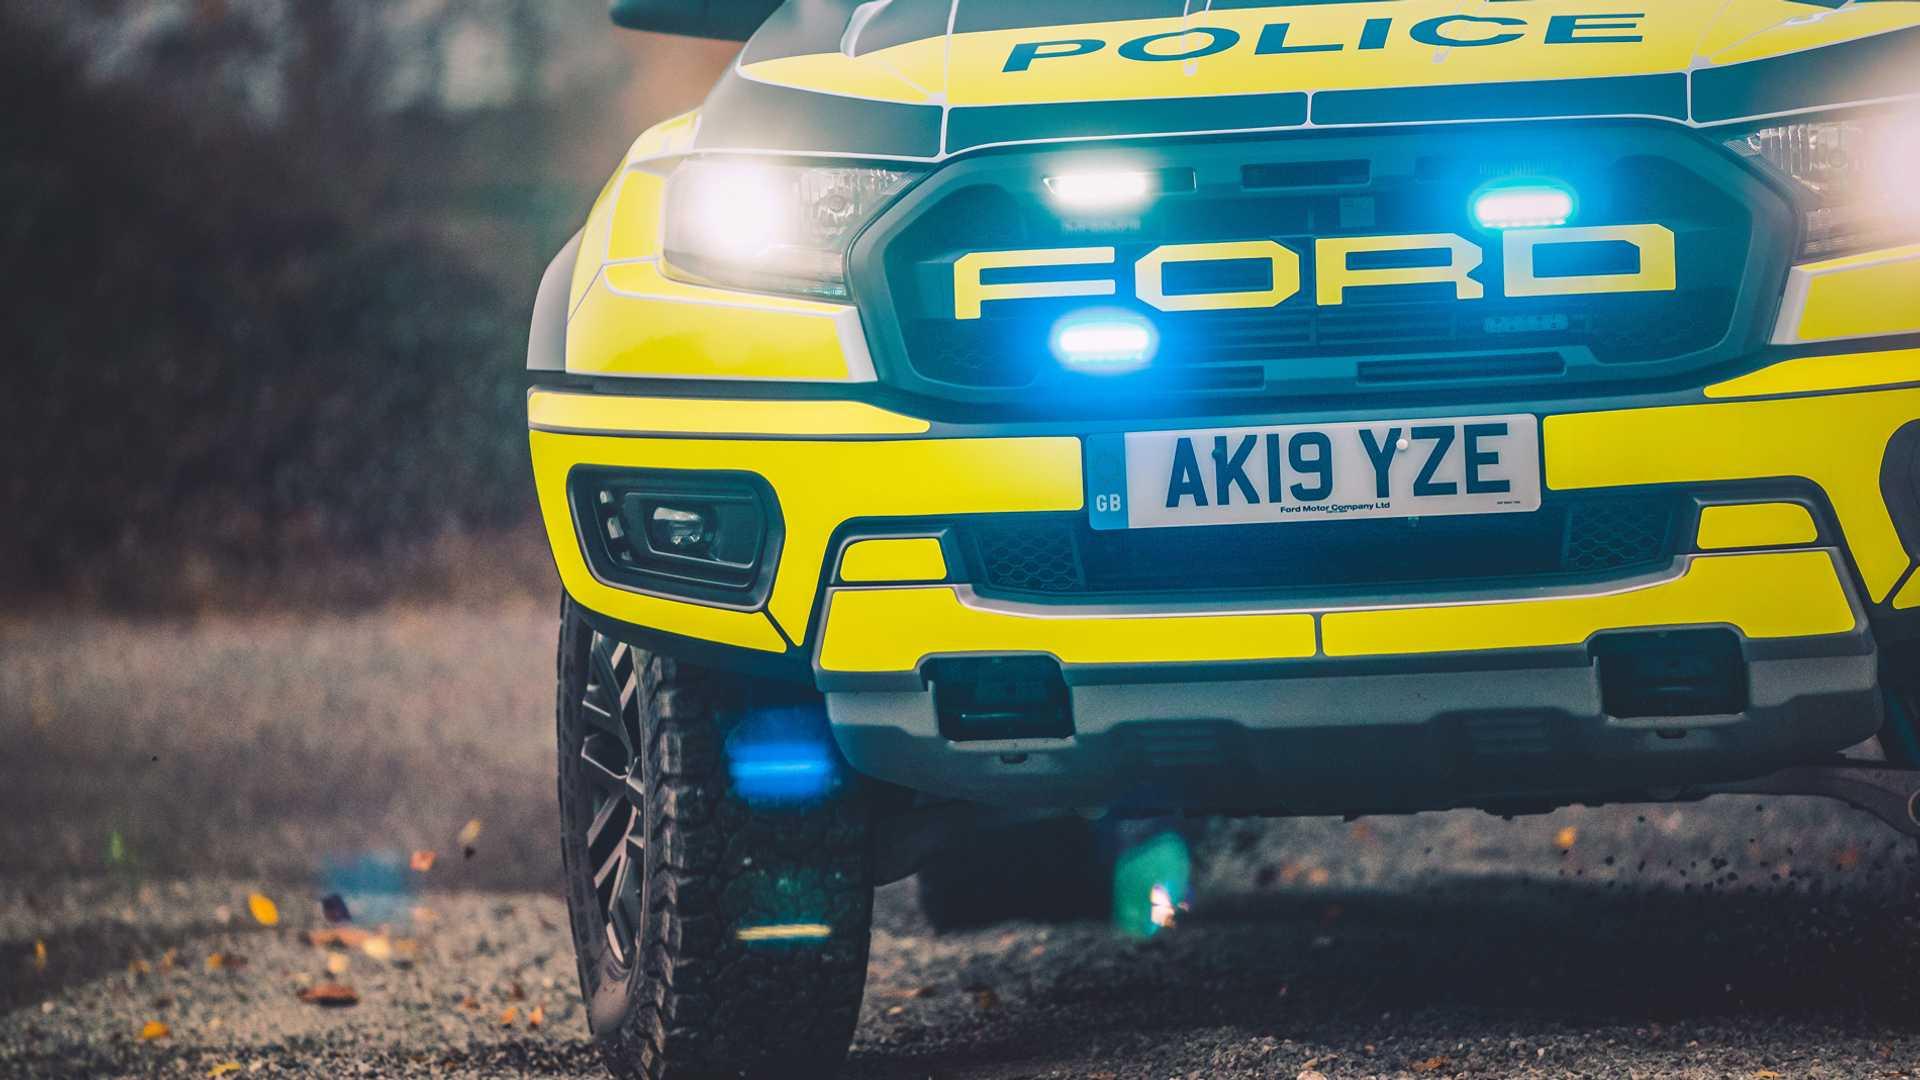 Ford-Focus-ST-and-Ranger-Raptor-UK-police-cars-18